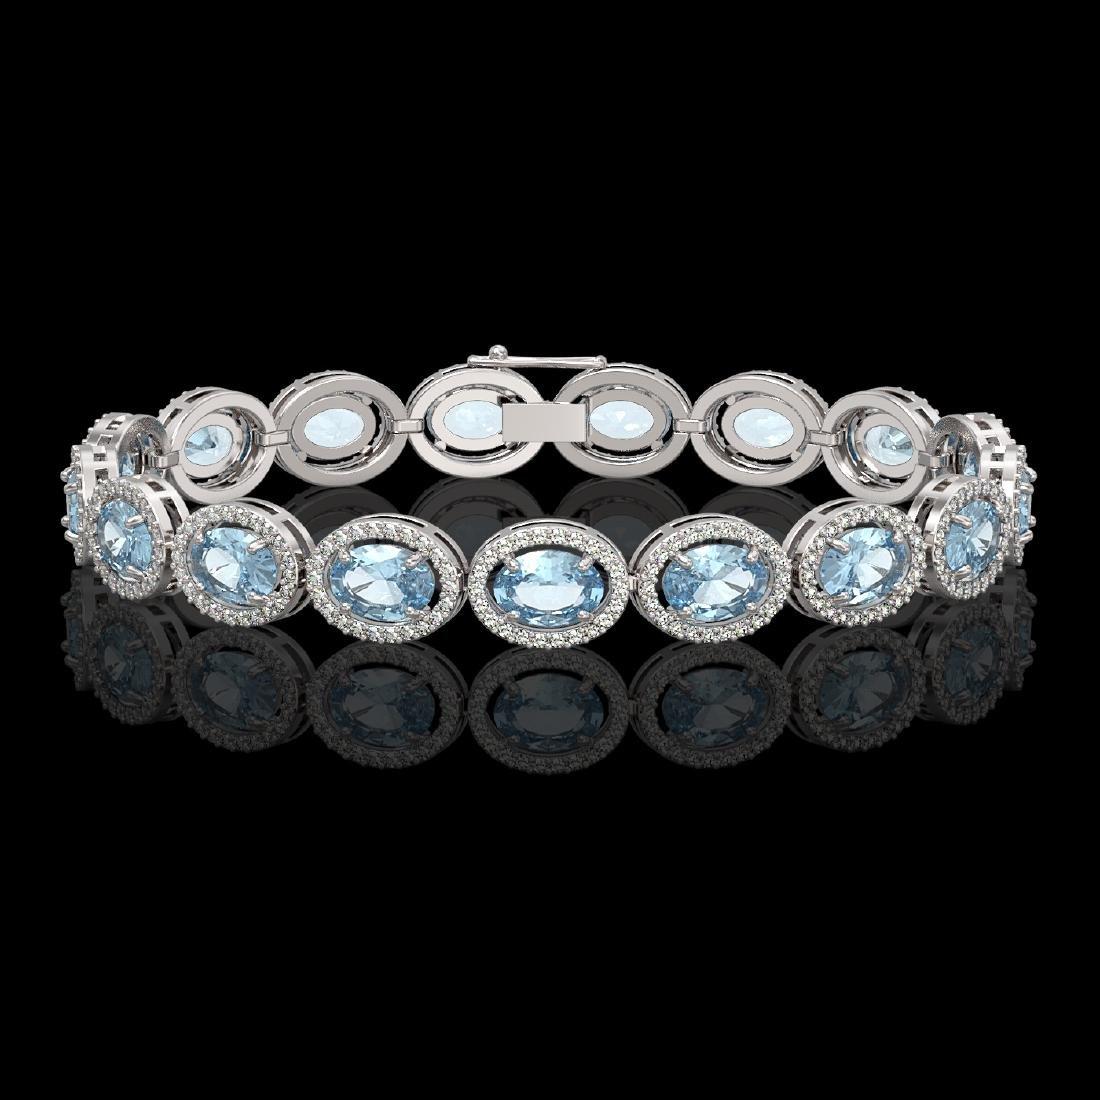 18.38 CTW Aquamarine & Diamond Halo Bracelet 10K White